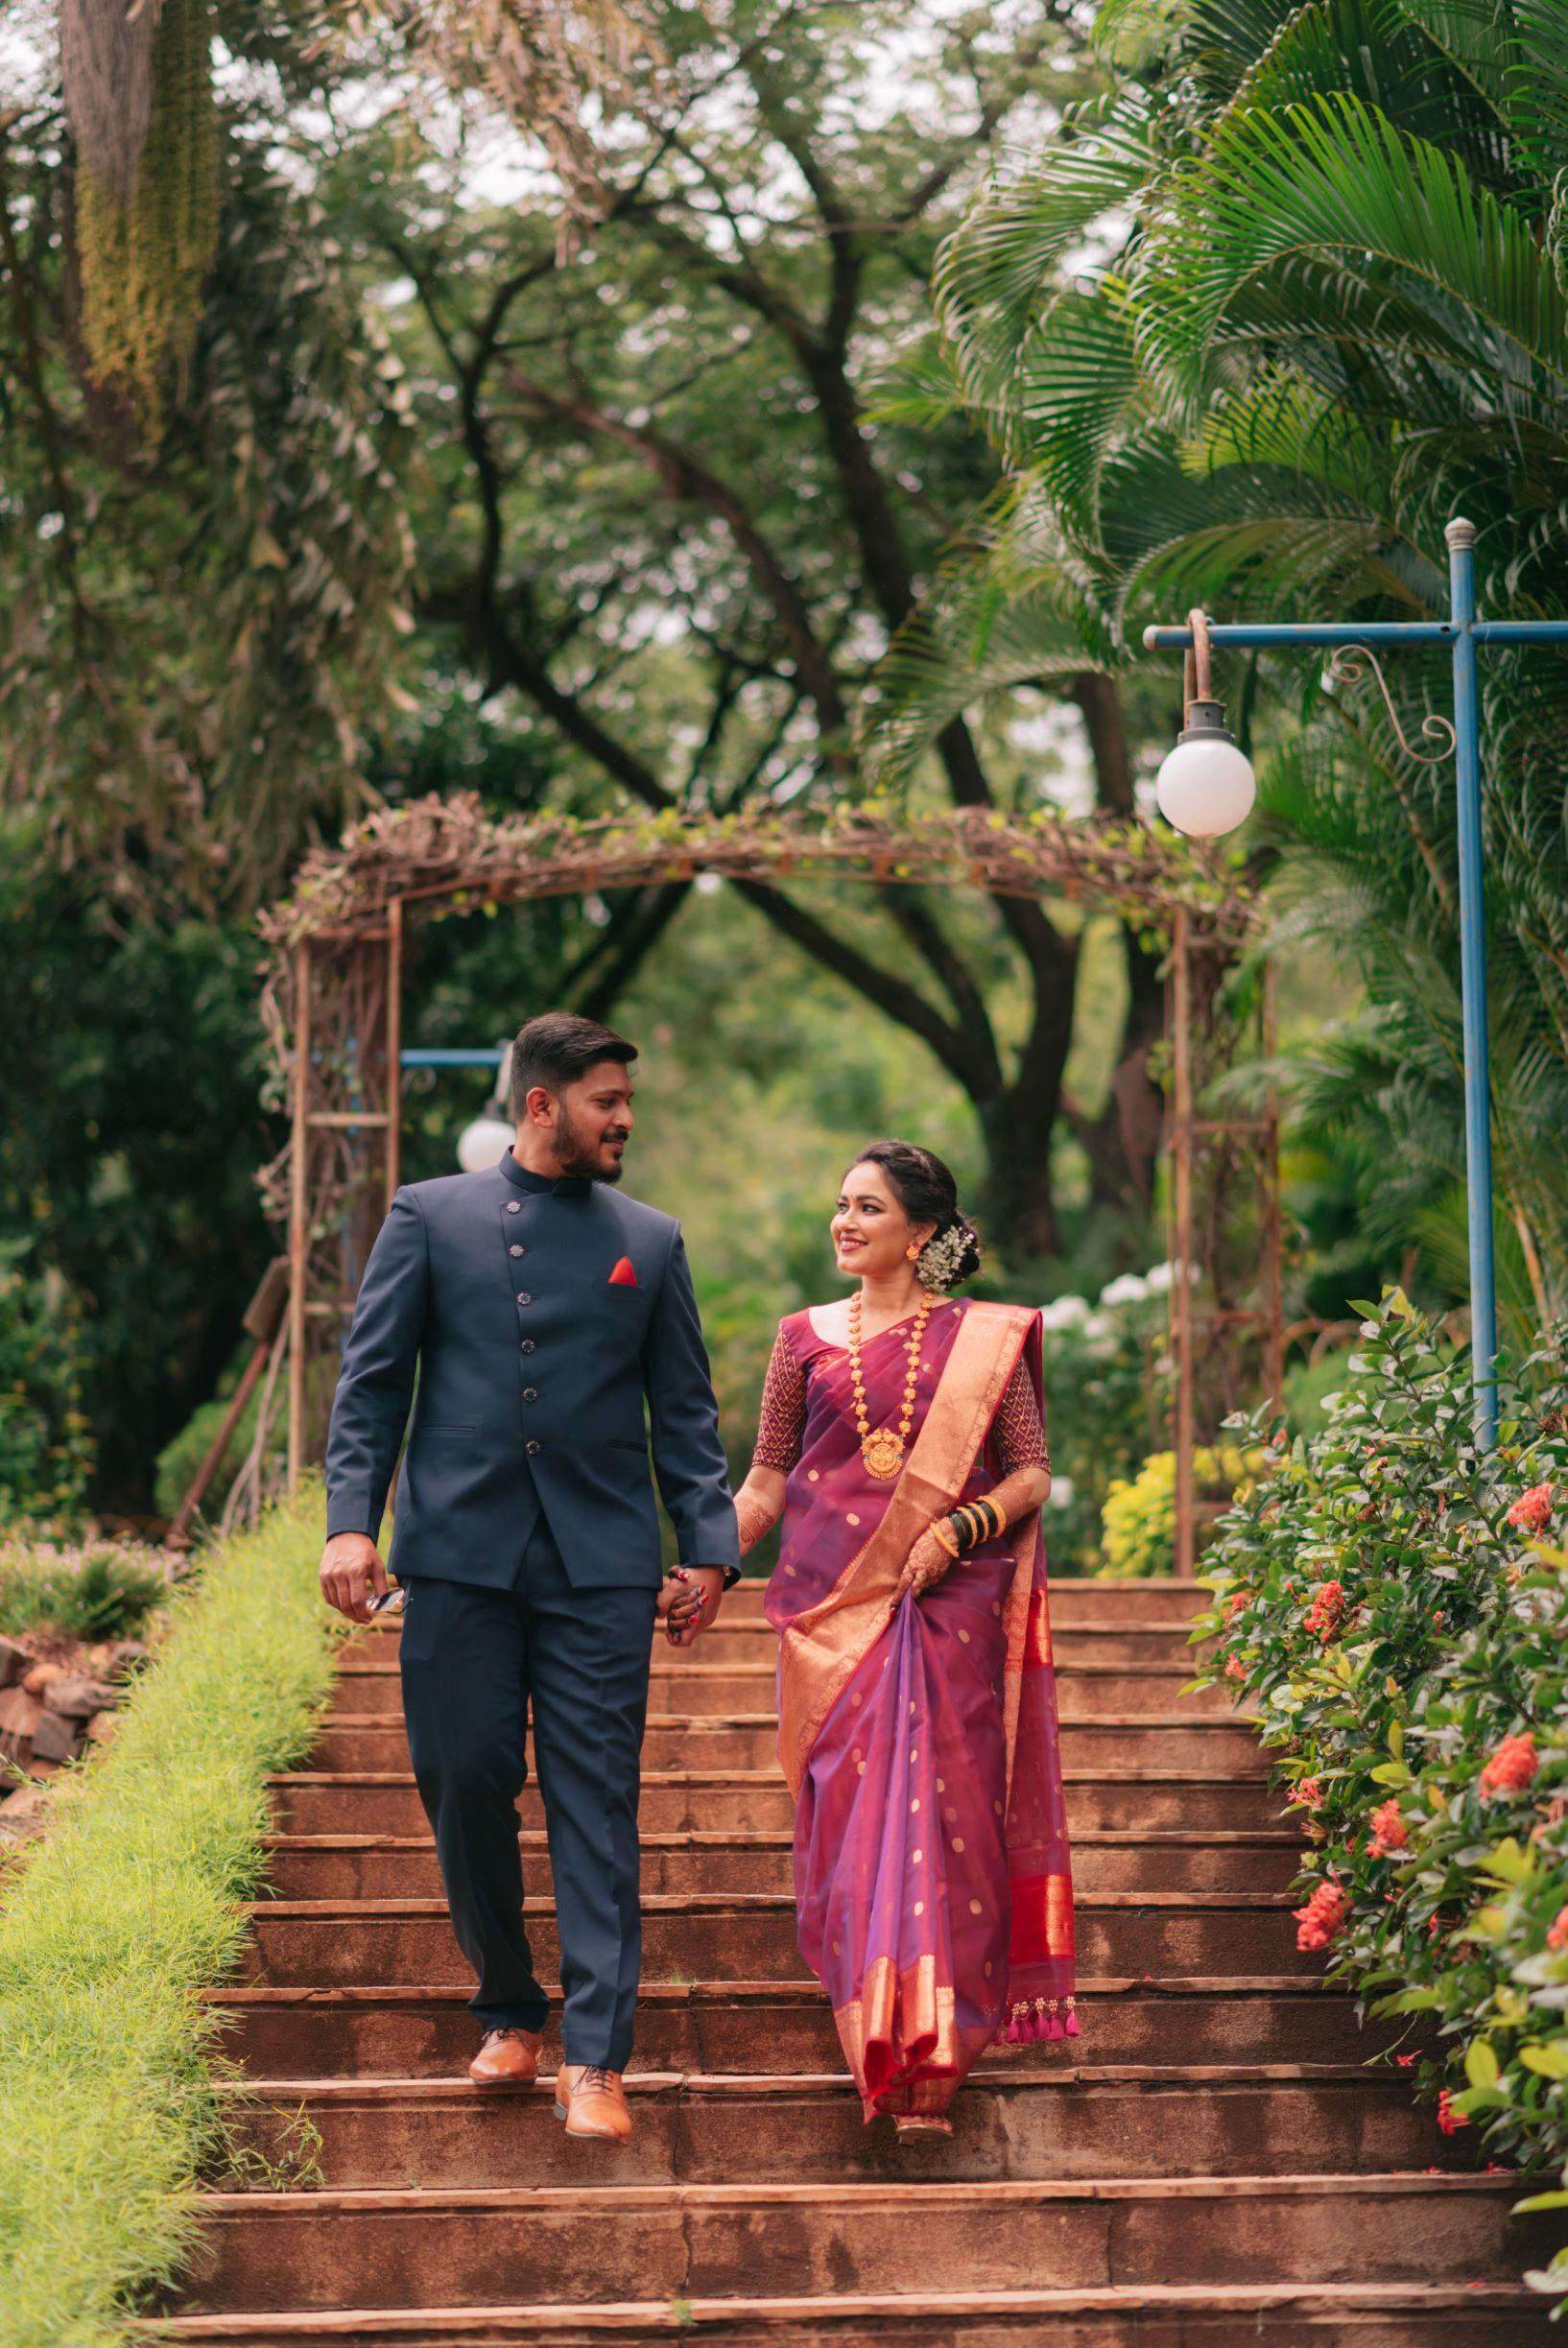 candid shot of the maharashtrian couple